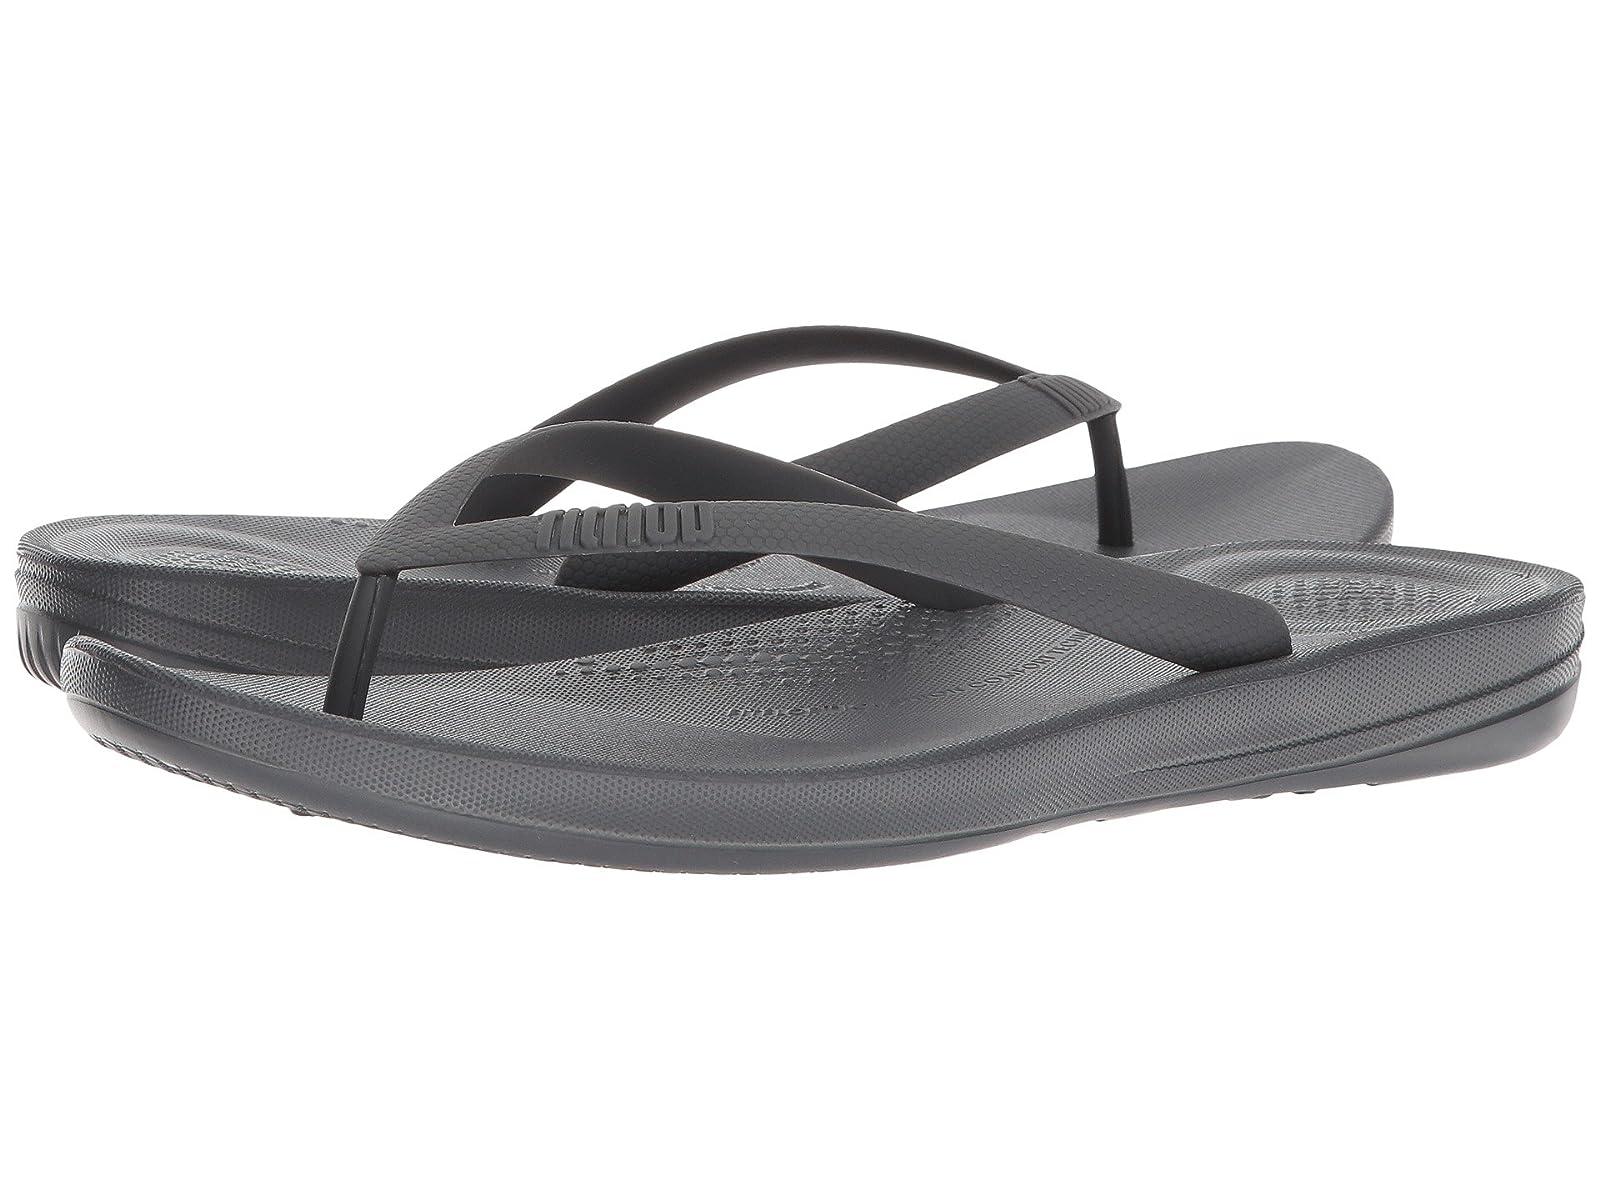 FitFlop Iqushion Ergonomic Flip-FlopsAtmospheric grades have affordable shoes